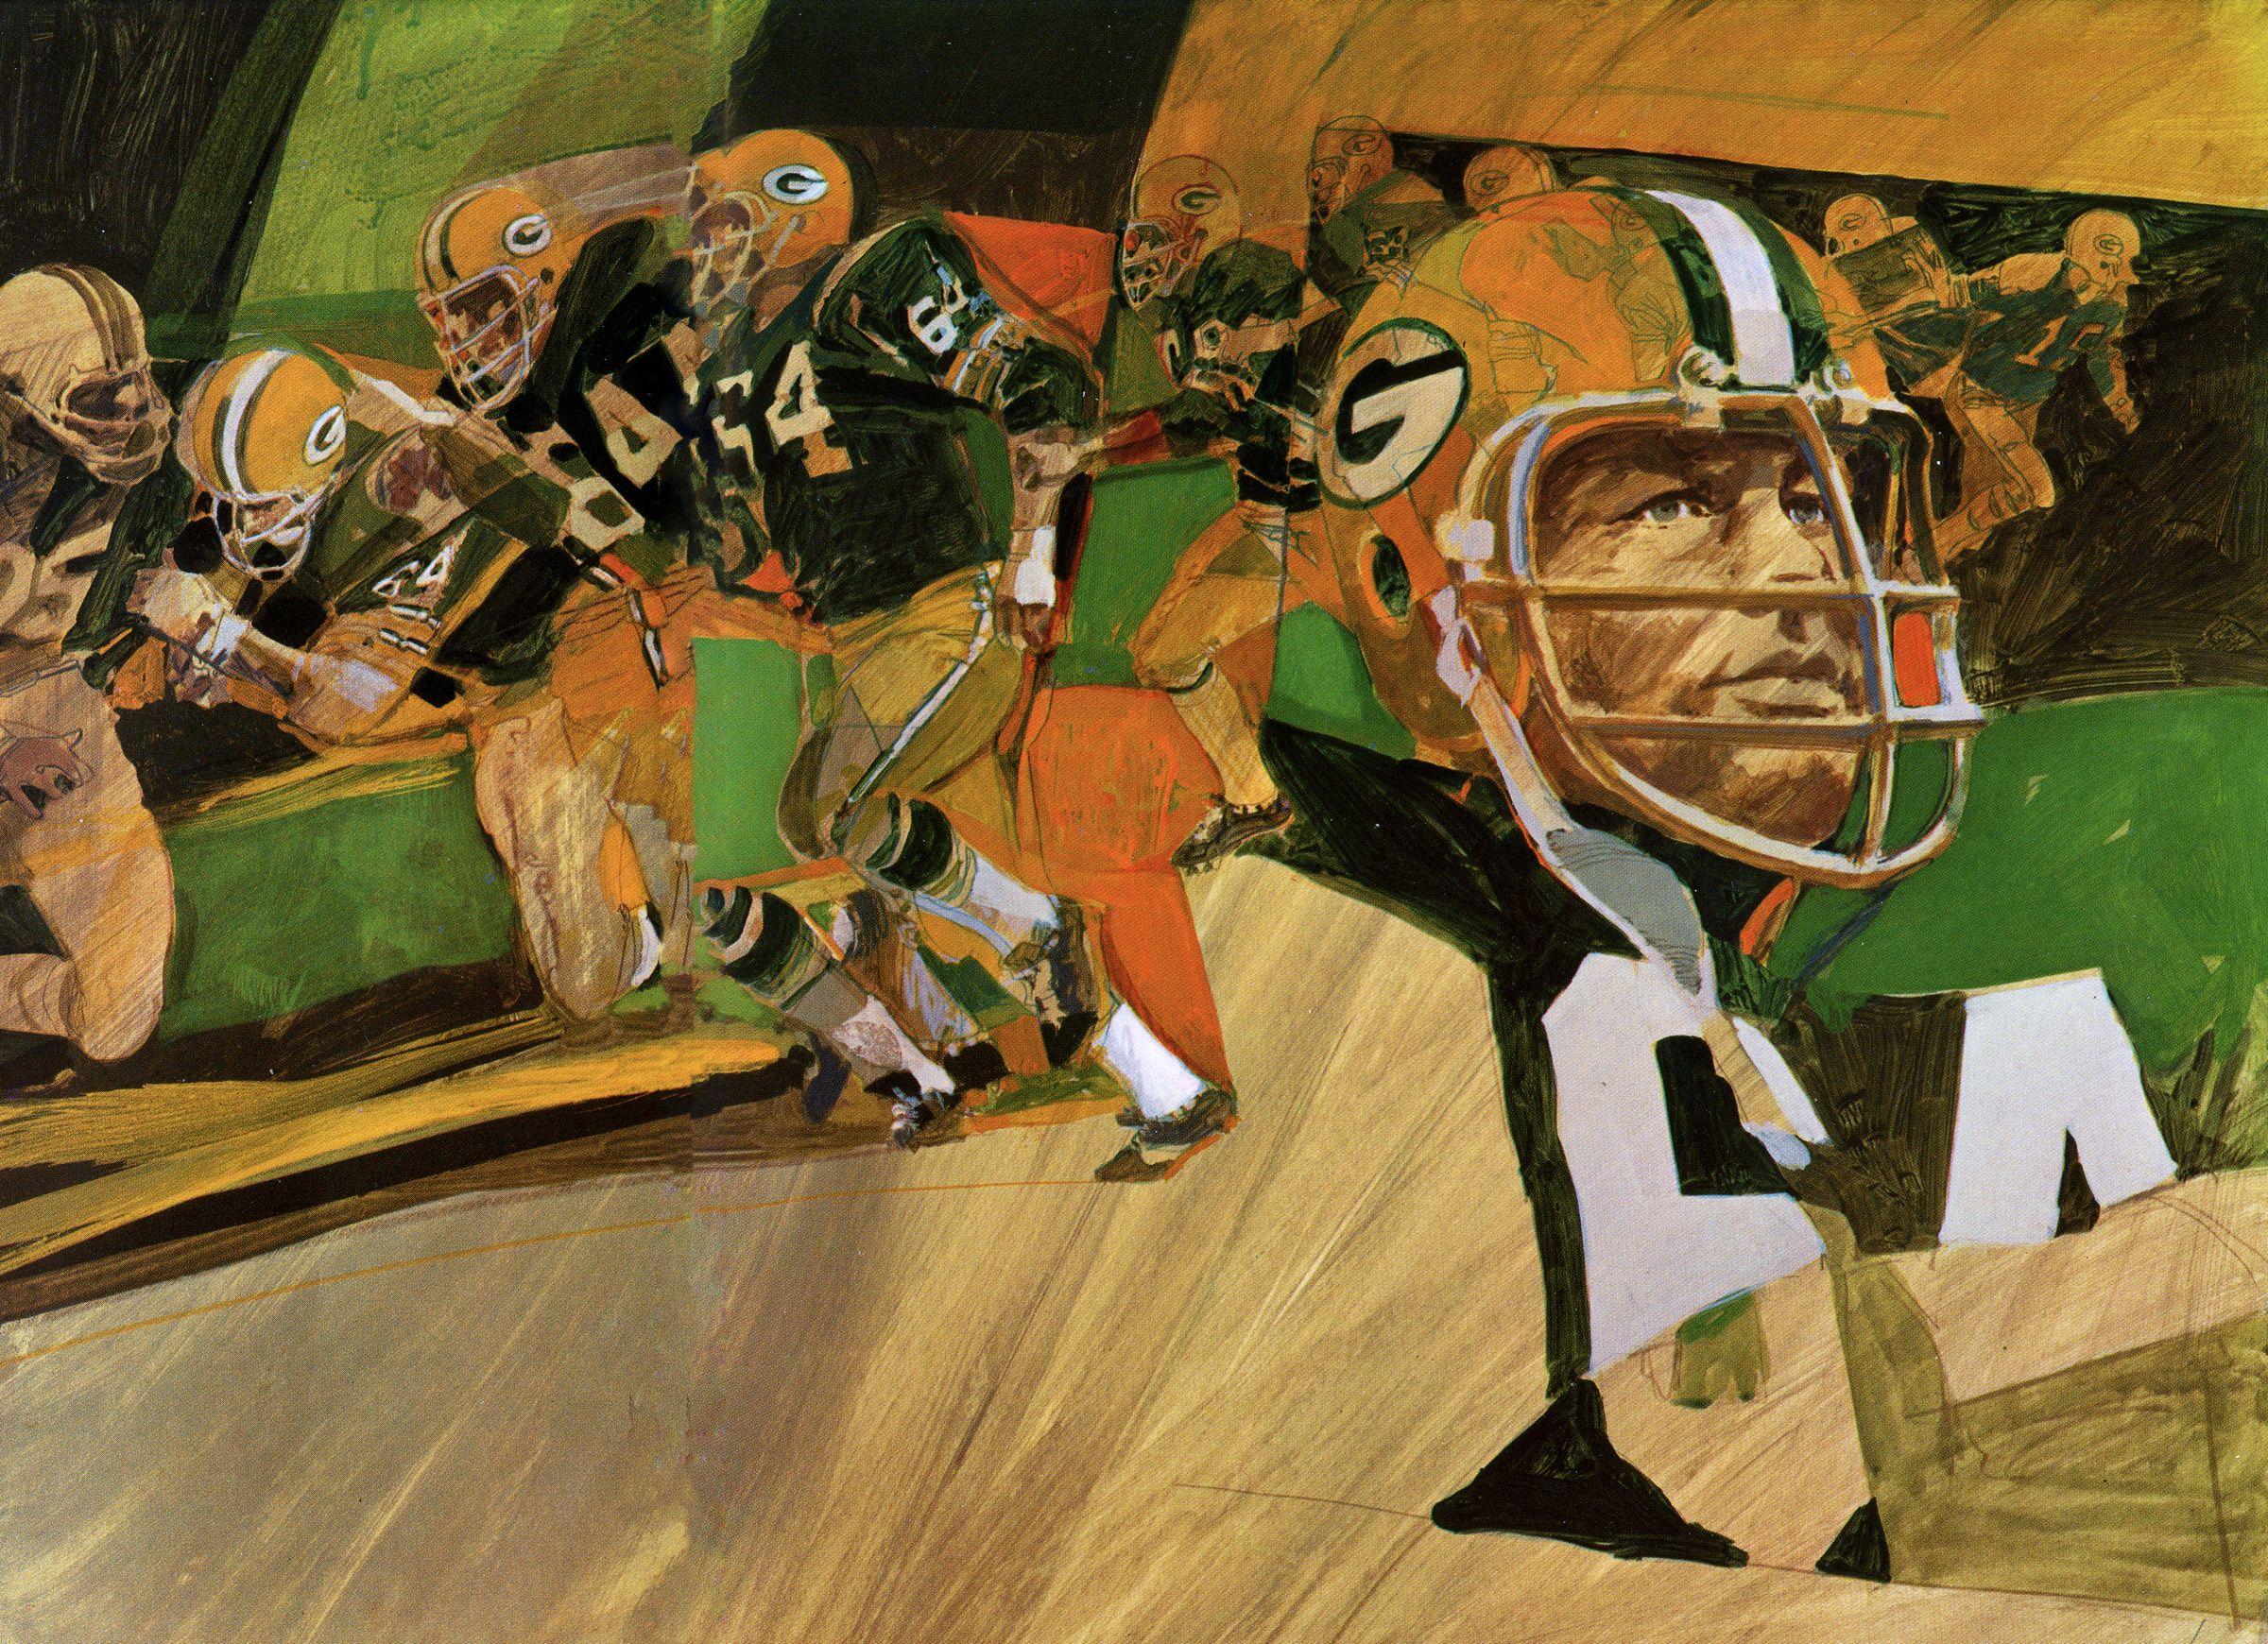 Guard Jerry Kramer Green Bay Packers Painting By George Bartell C 1969 Green Bay Packers Art Nfl Football Art Football Art